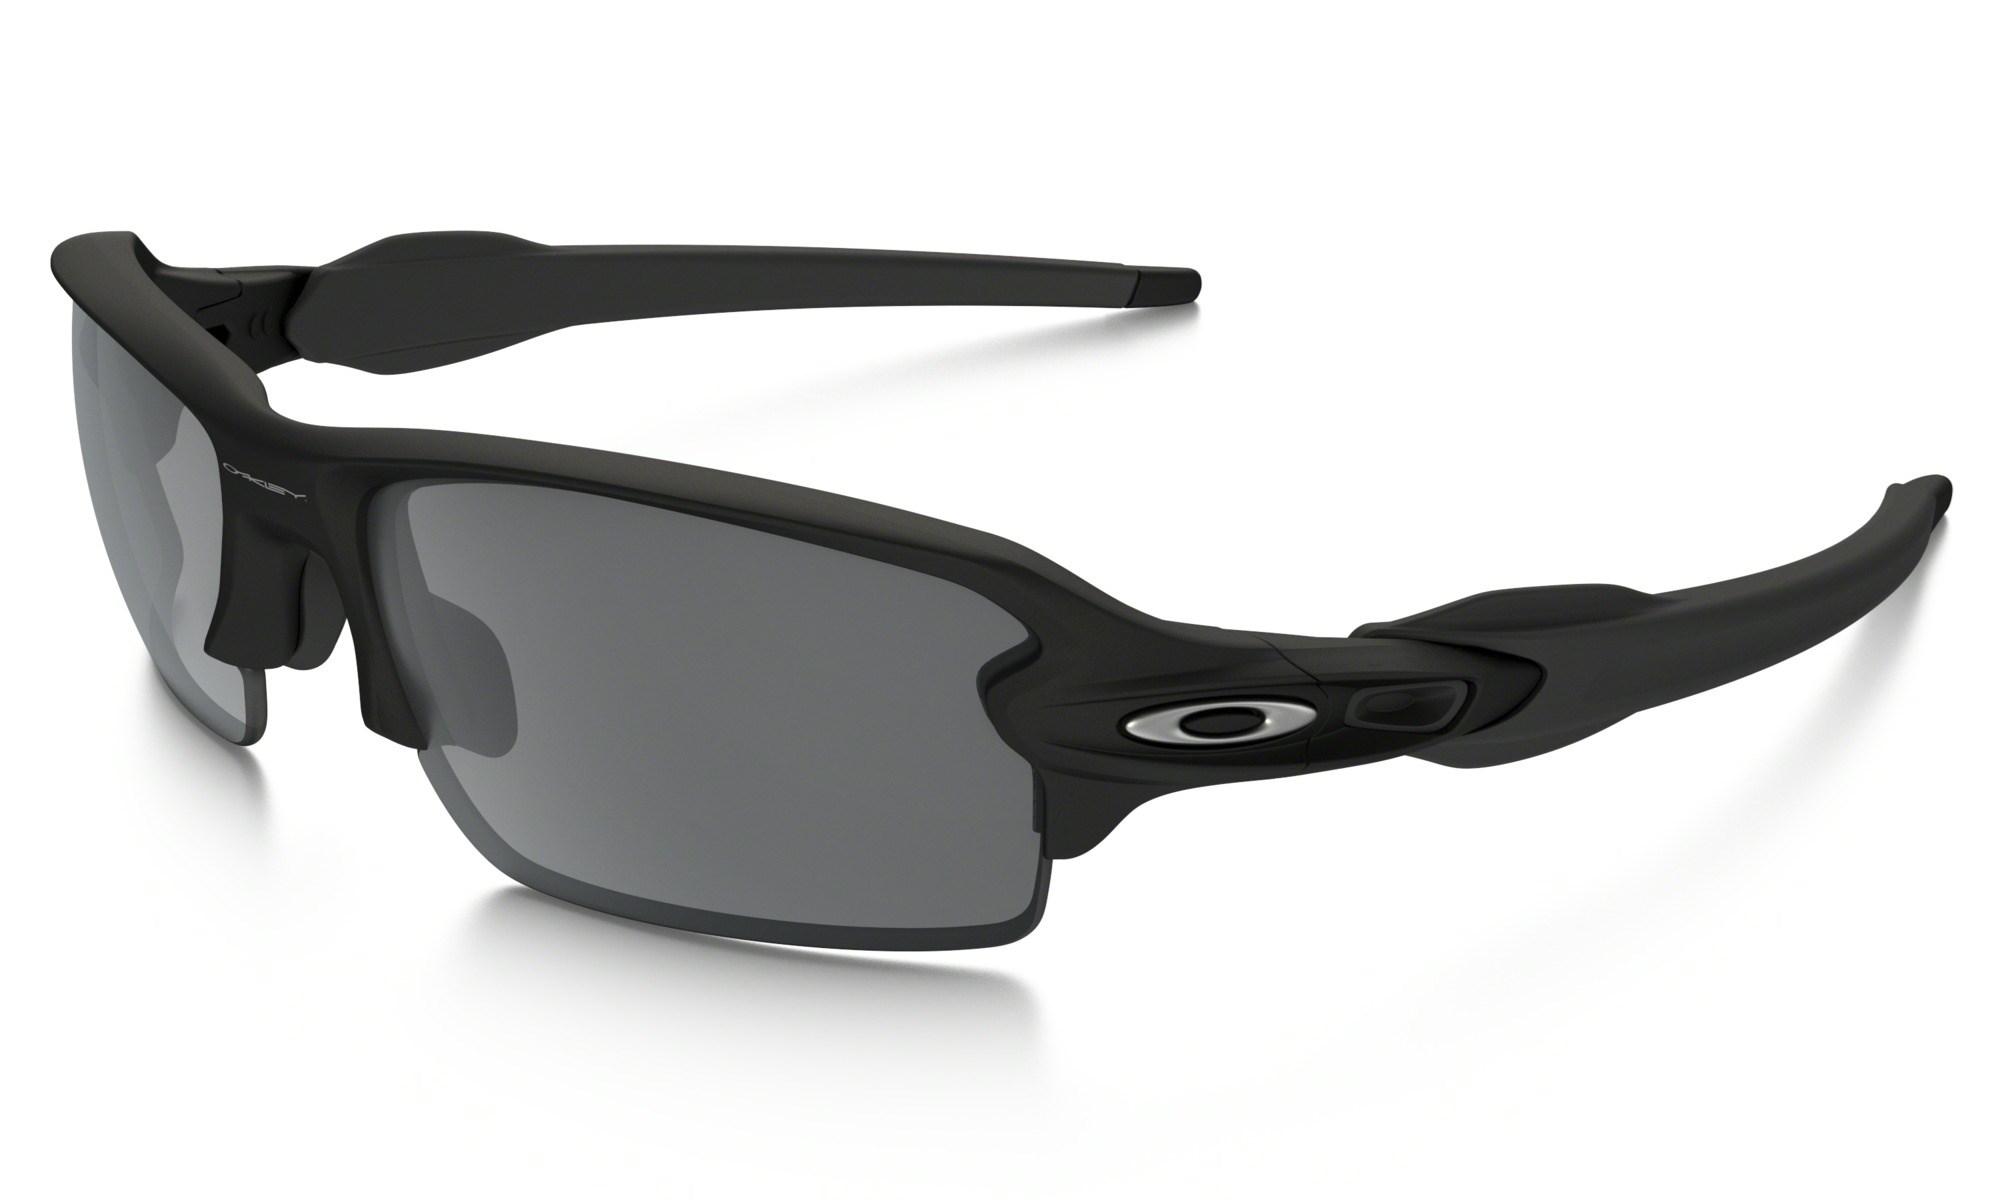 5777f4fa2cc Oakley Flak 2.0 Matte Black Black Iridium. 0 (Be the first to add a review!)